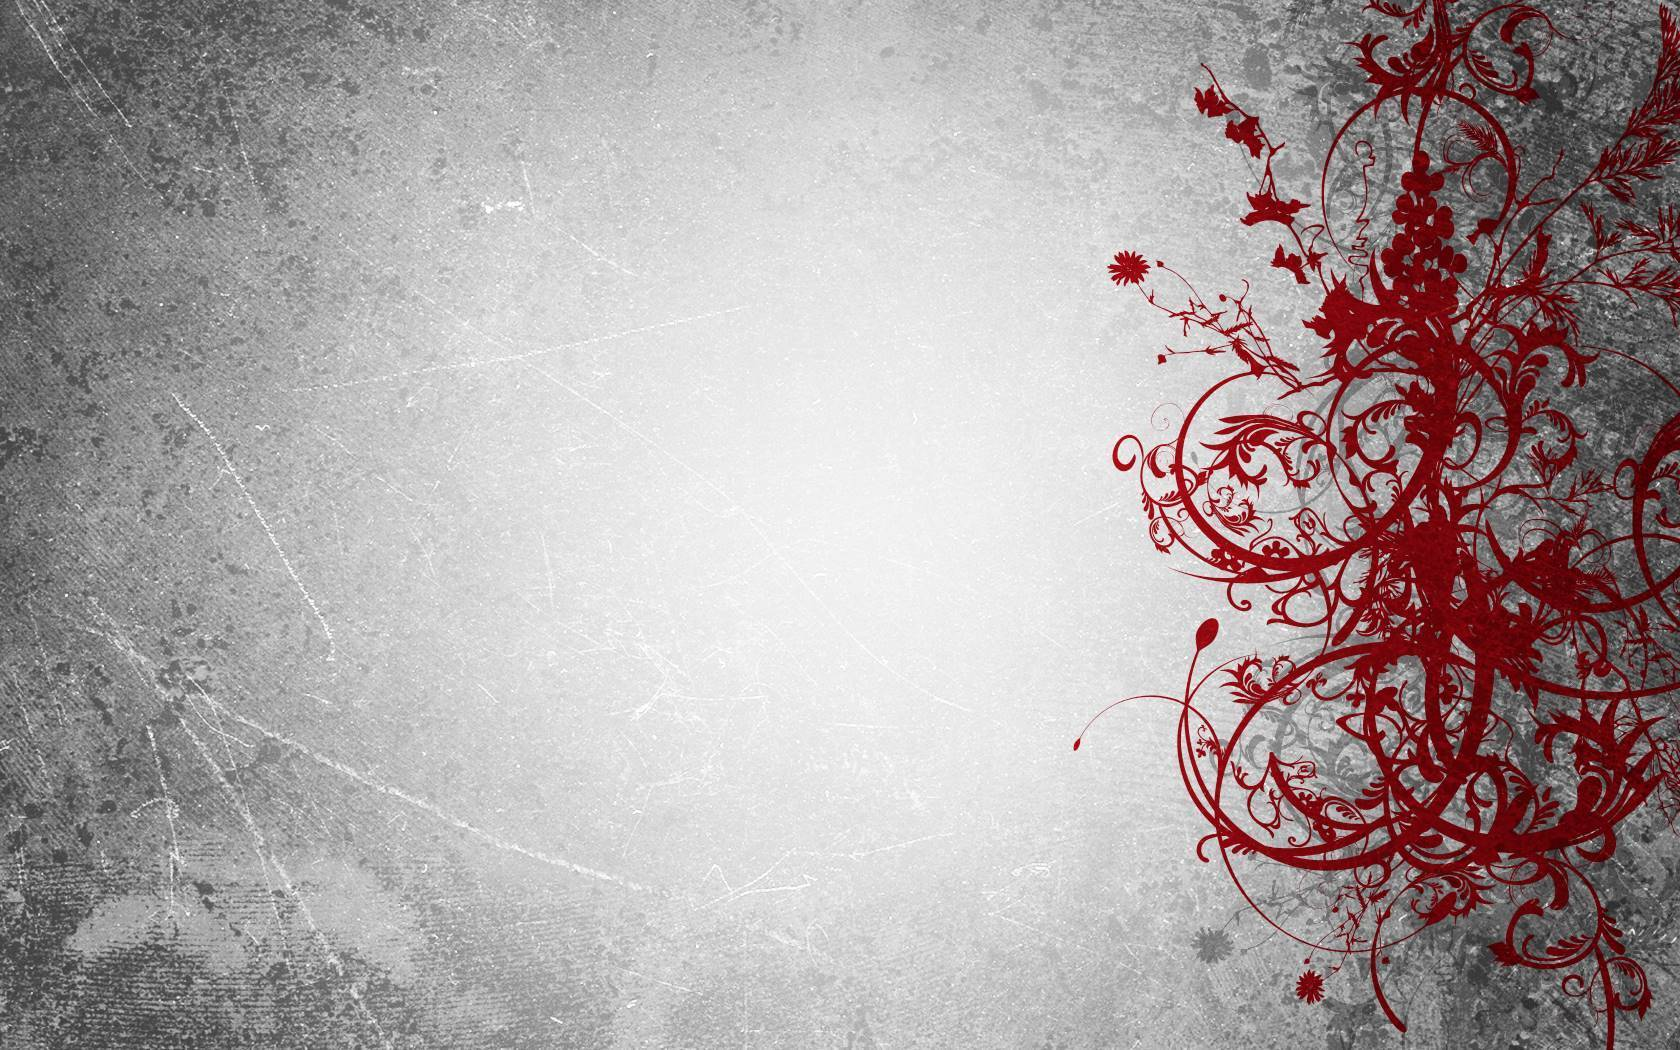 Red Desktop Wallpaper - Red Wallpaper (11661072) - Fanpop